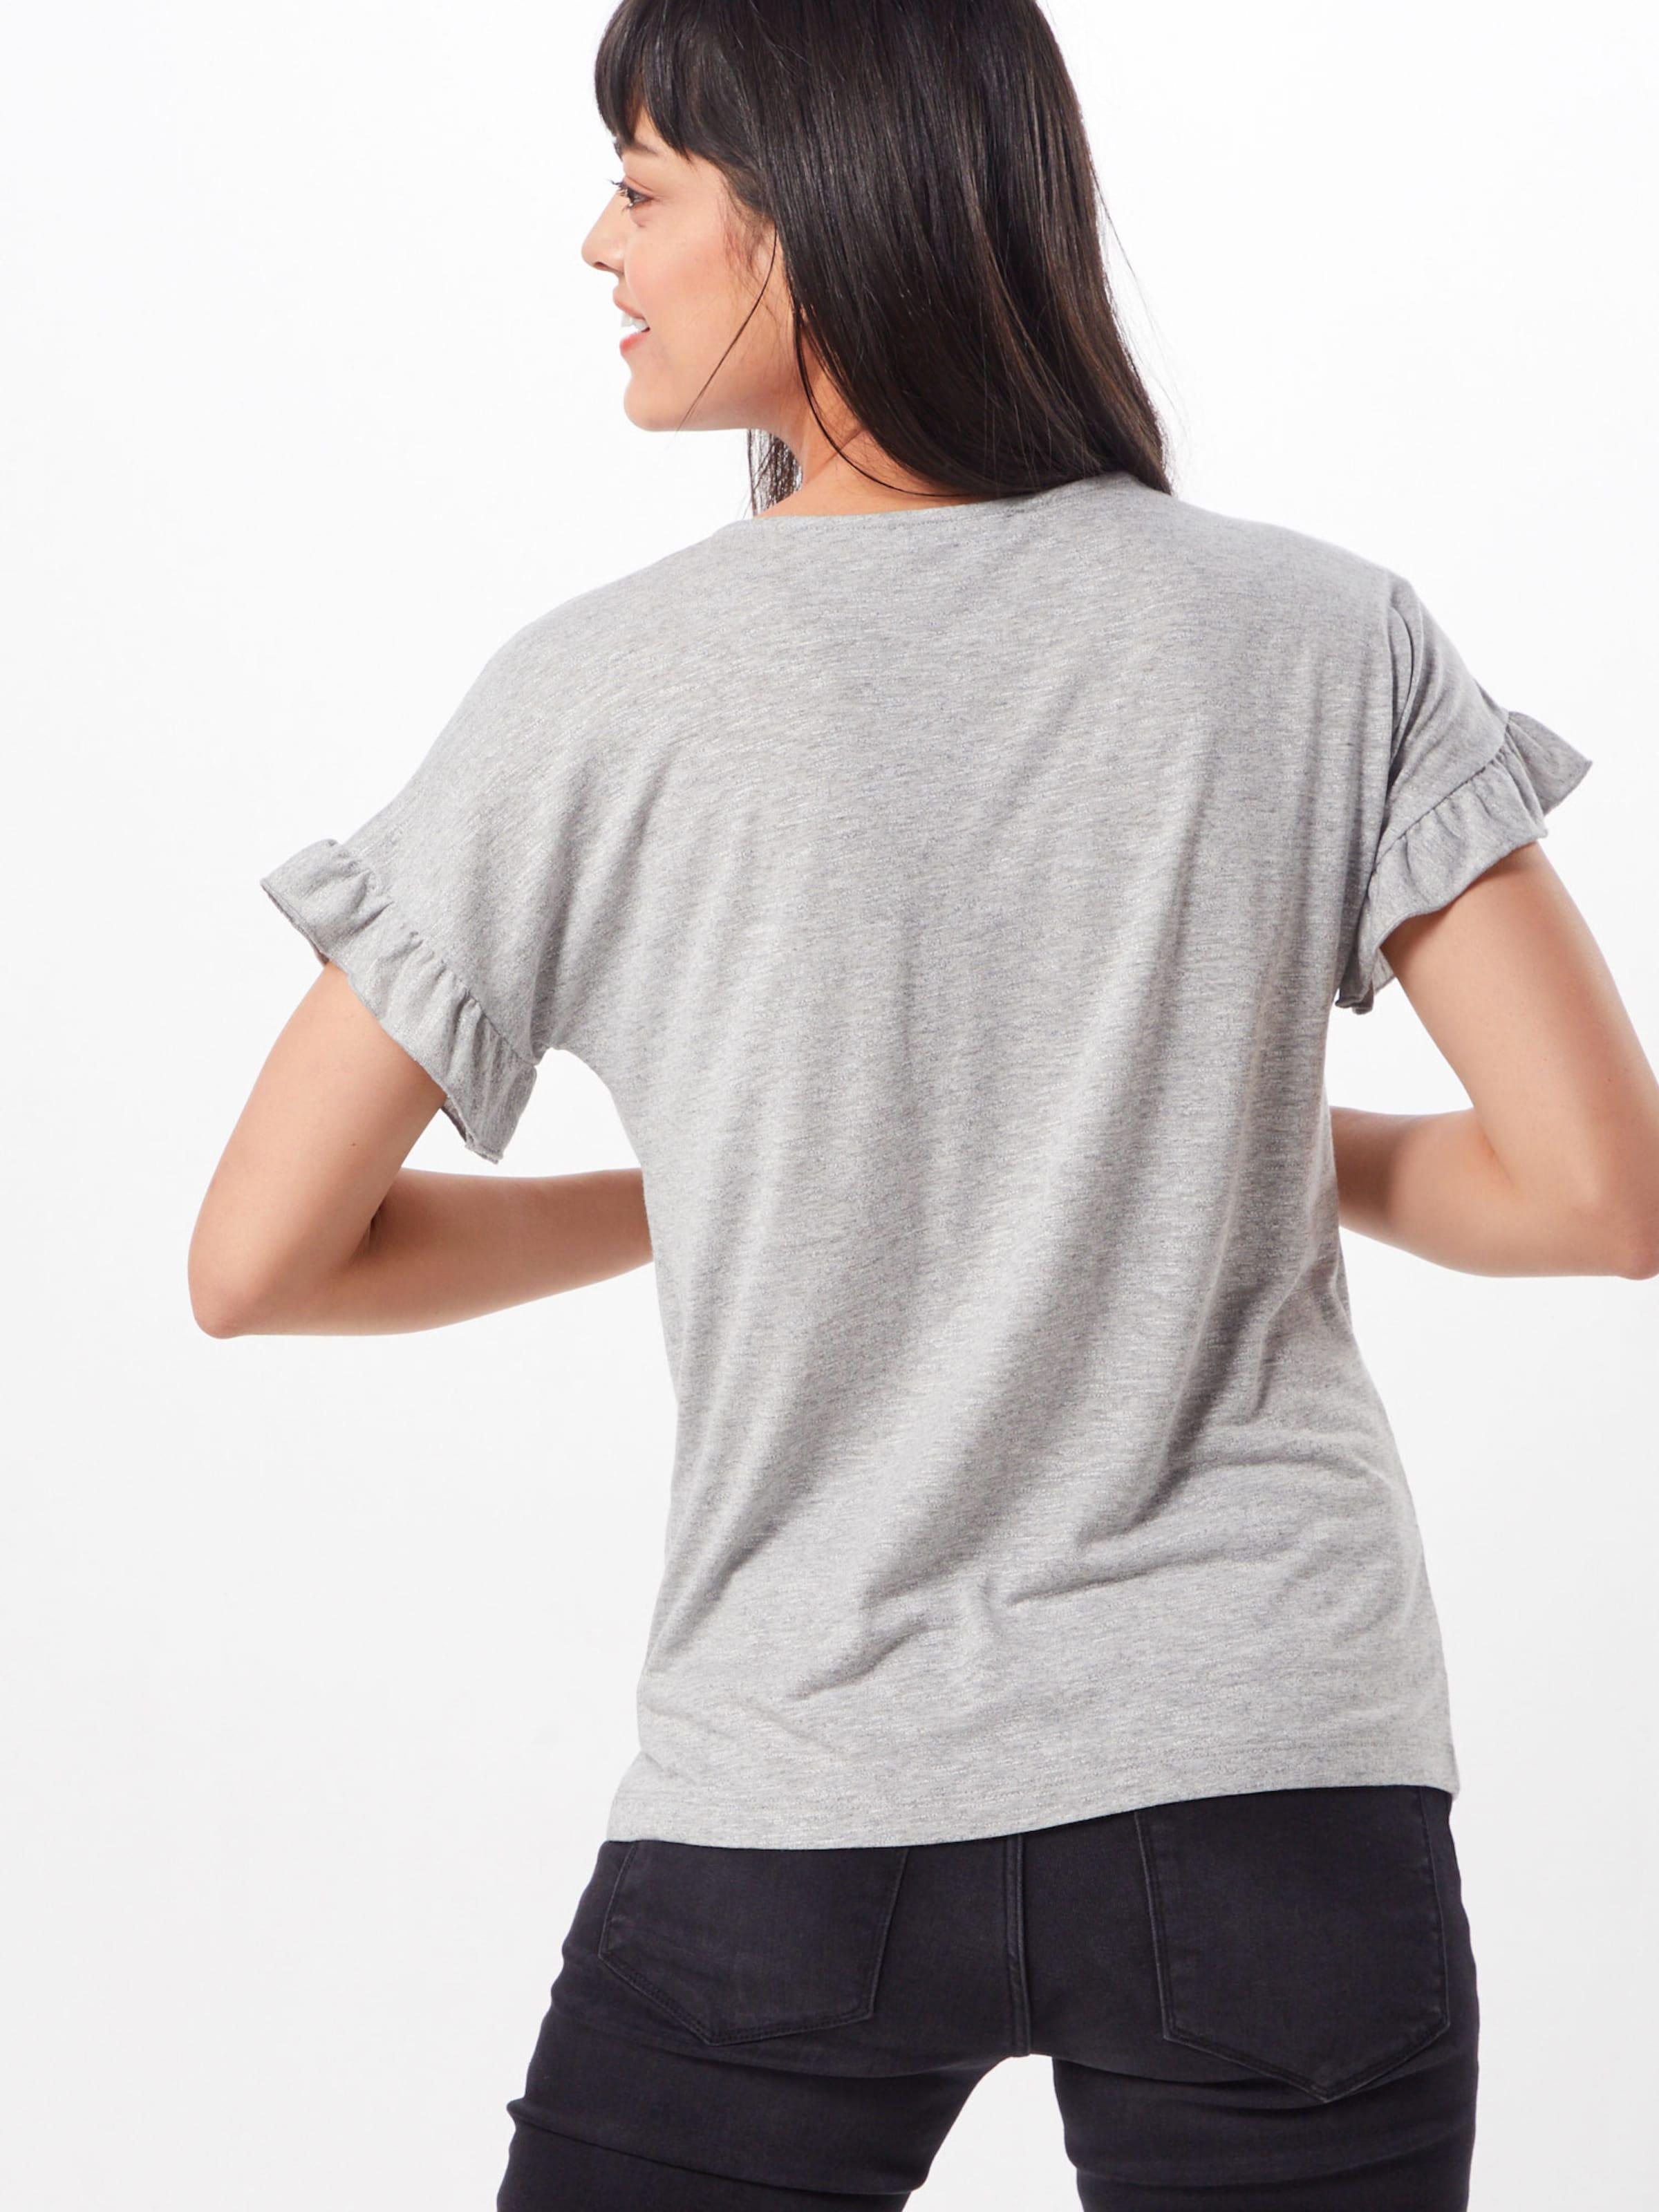 'lia' En About T Blanc shirt You 8n0wXOPkN